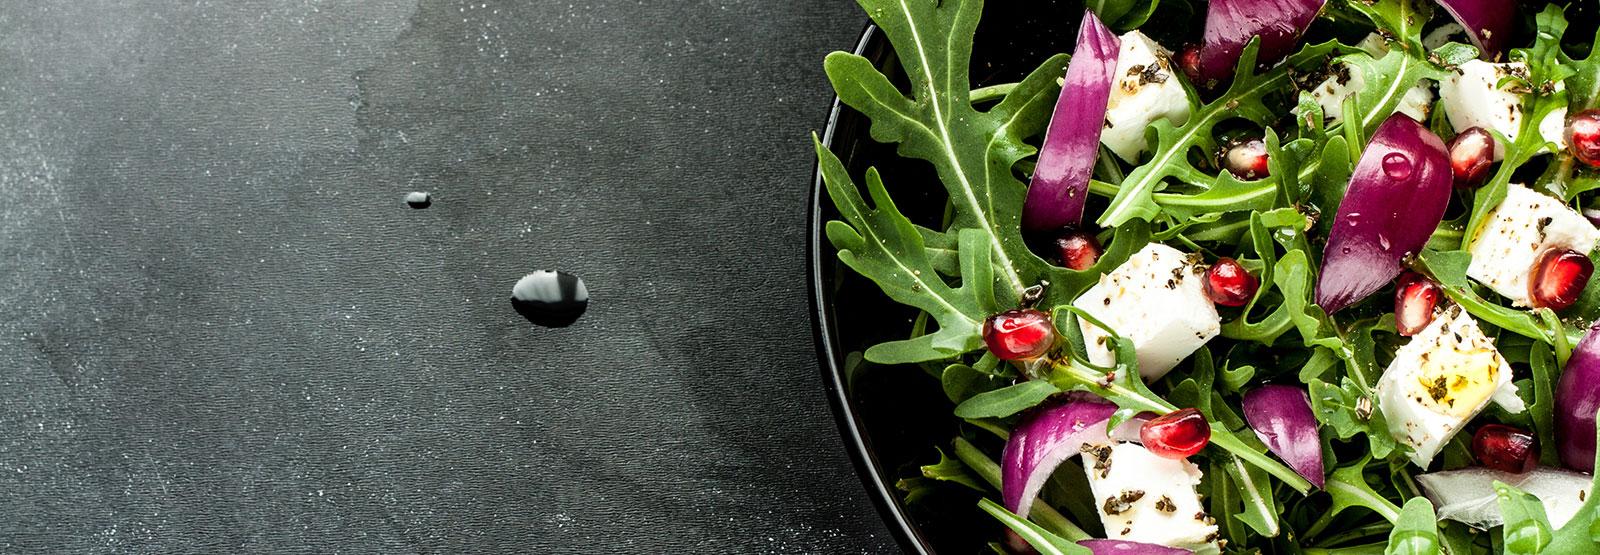 A bowl of healthy rocket salad